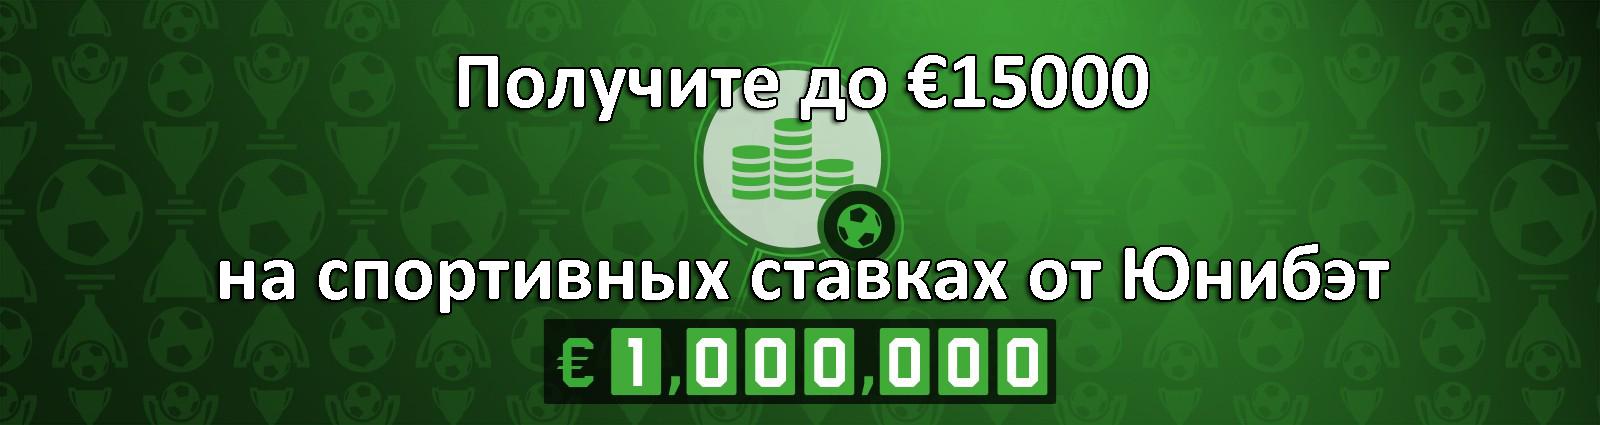 Получите до €15000 на спортивных ставках от Юнибэт